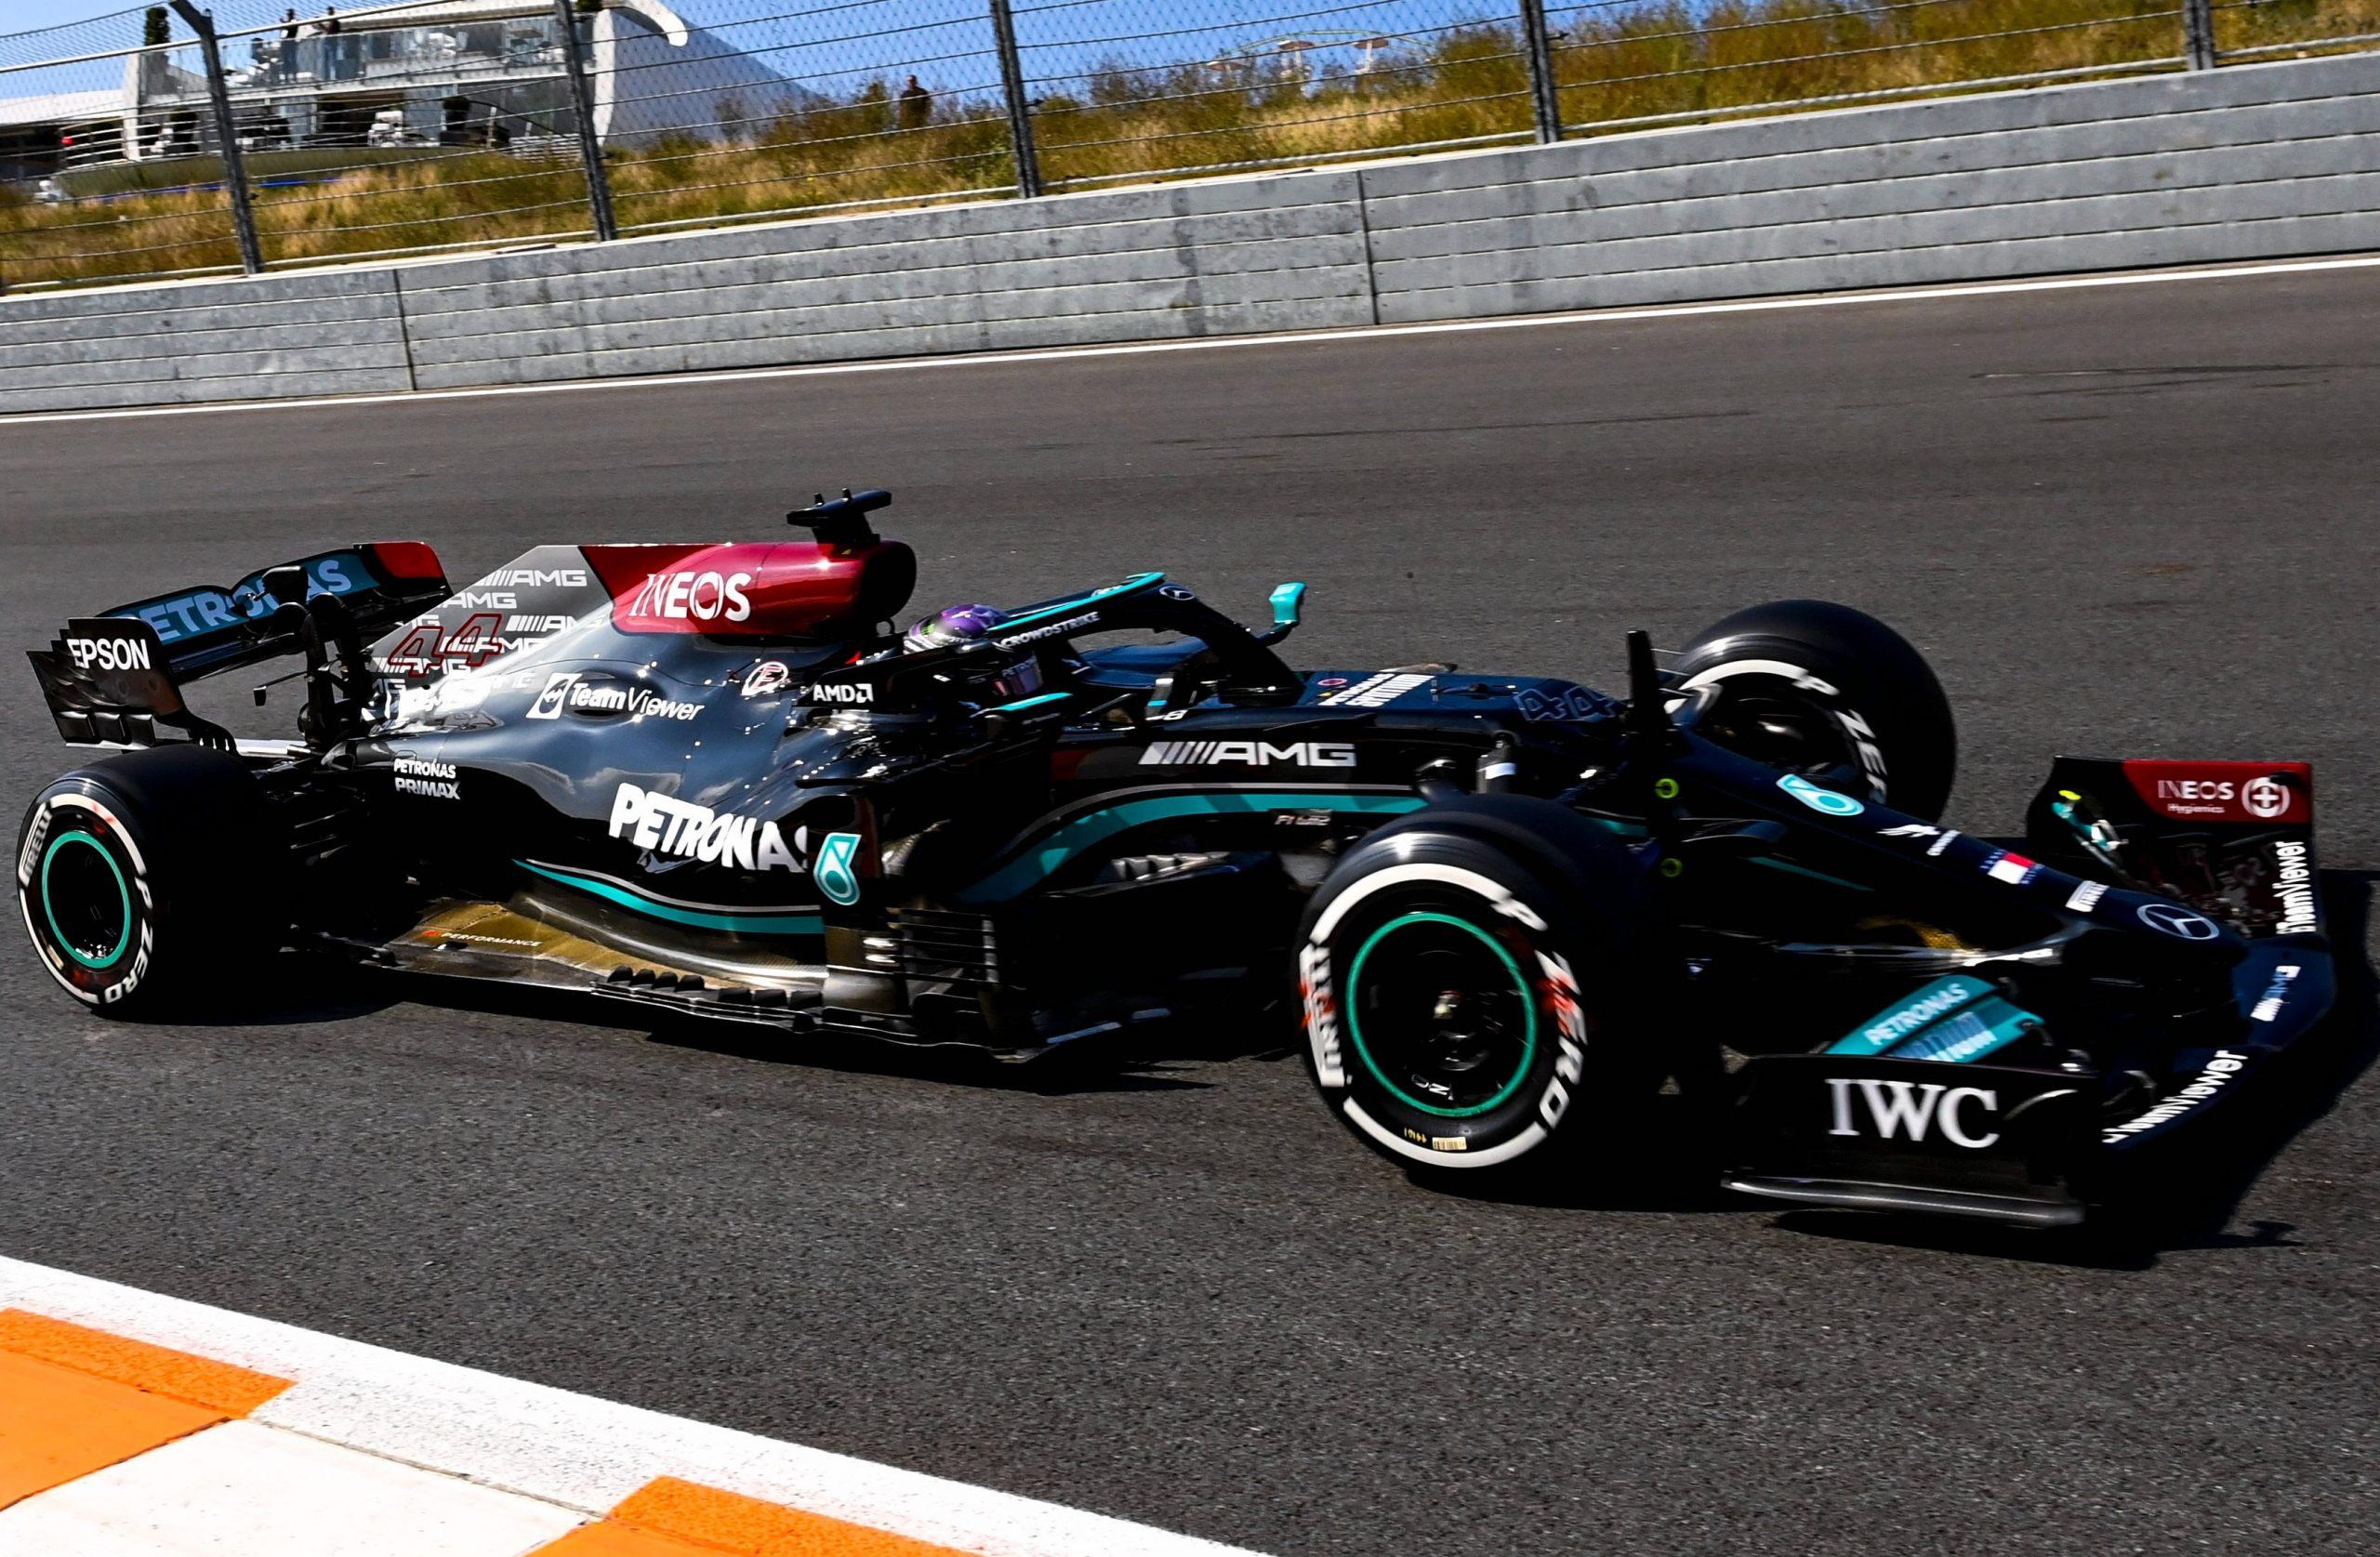 FP1, Gp Olanda: Hamilton primo, davanti a Verstappen. Ferrari 3° e 4°.